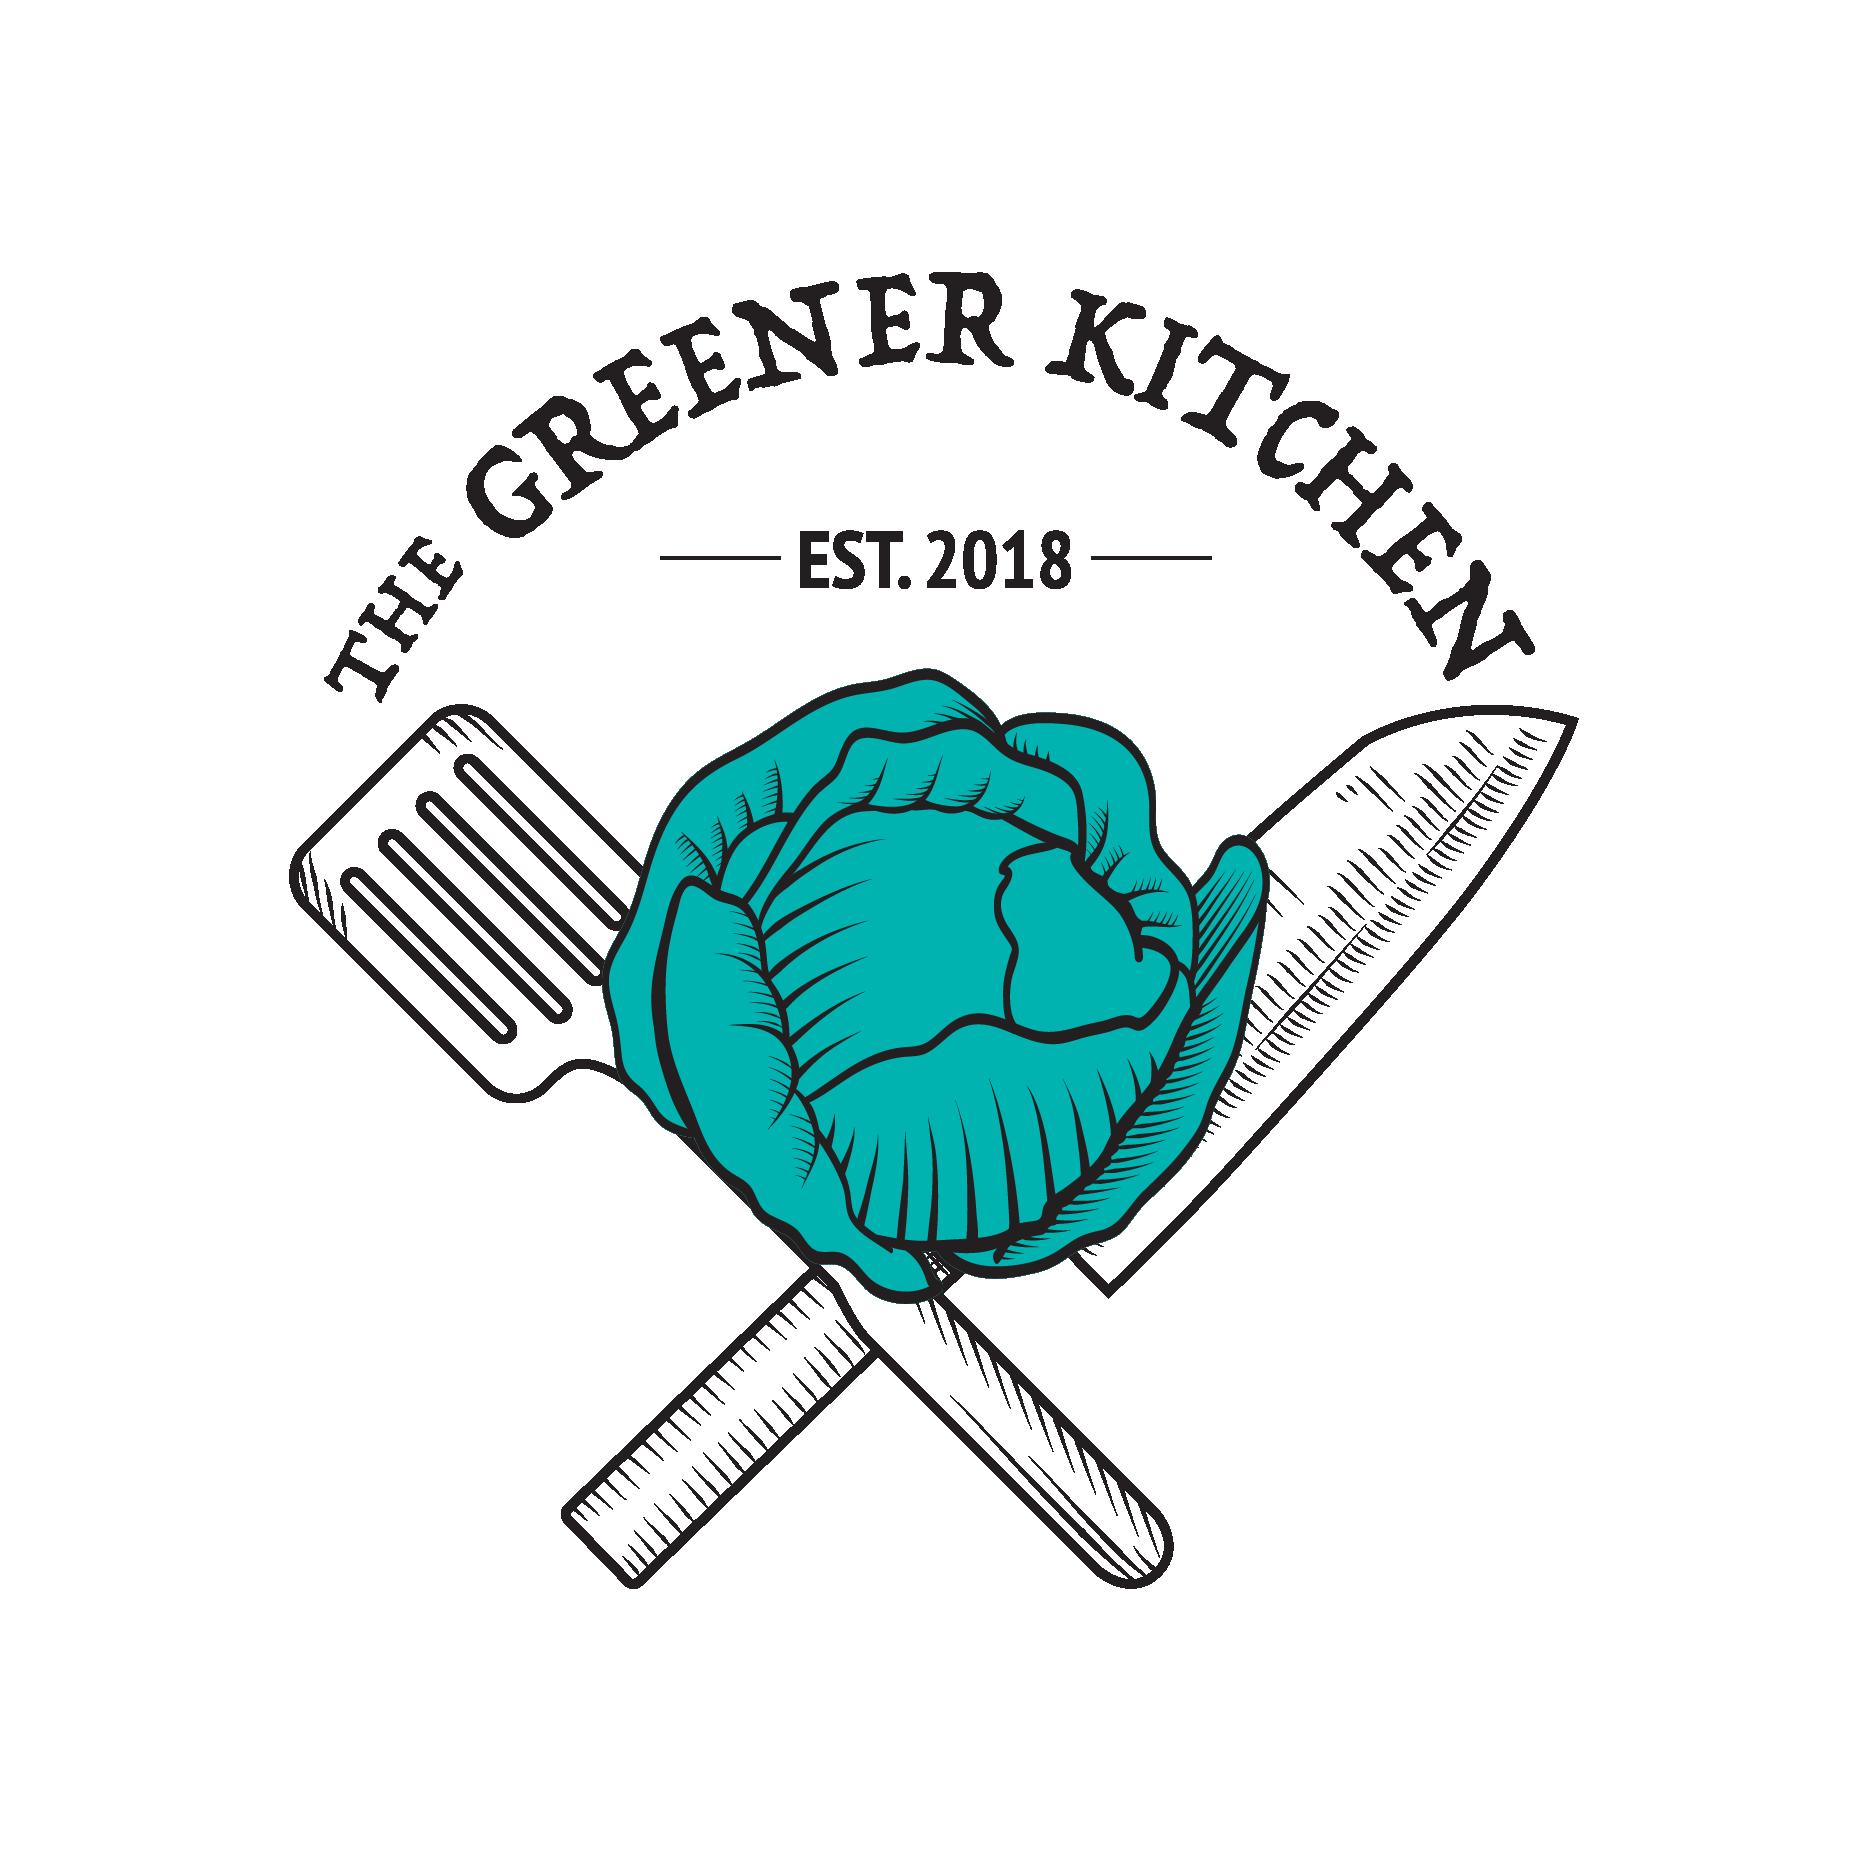 GreenerKitchen_CMYK_Color (1).png